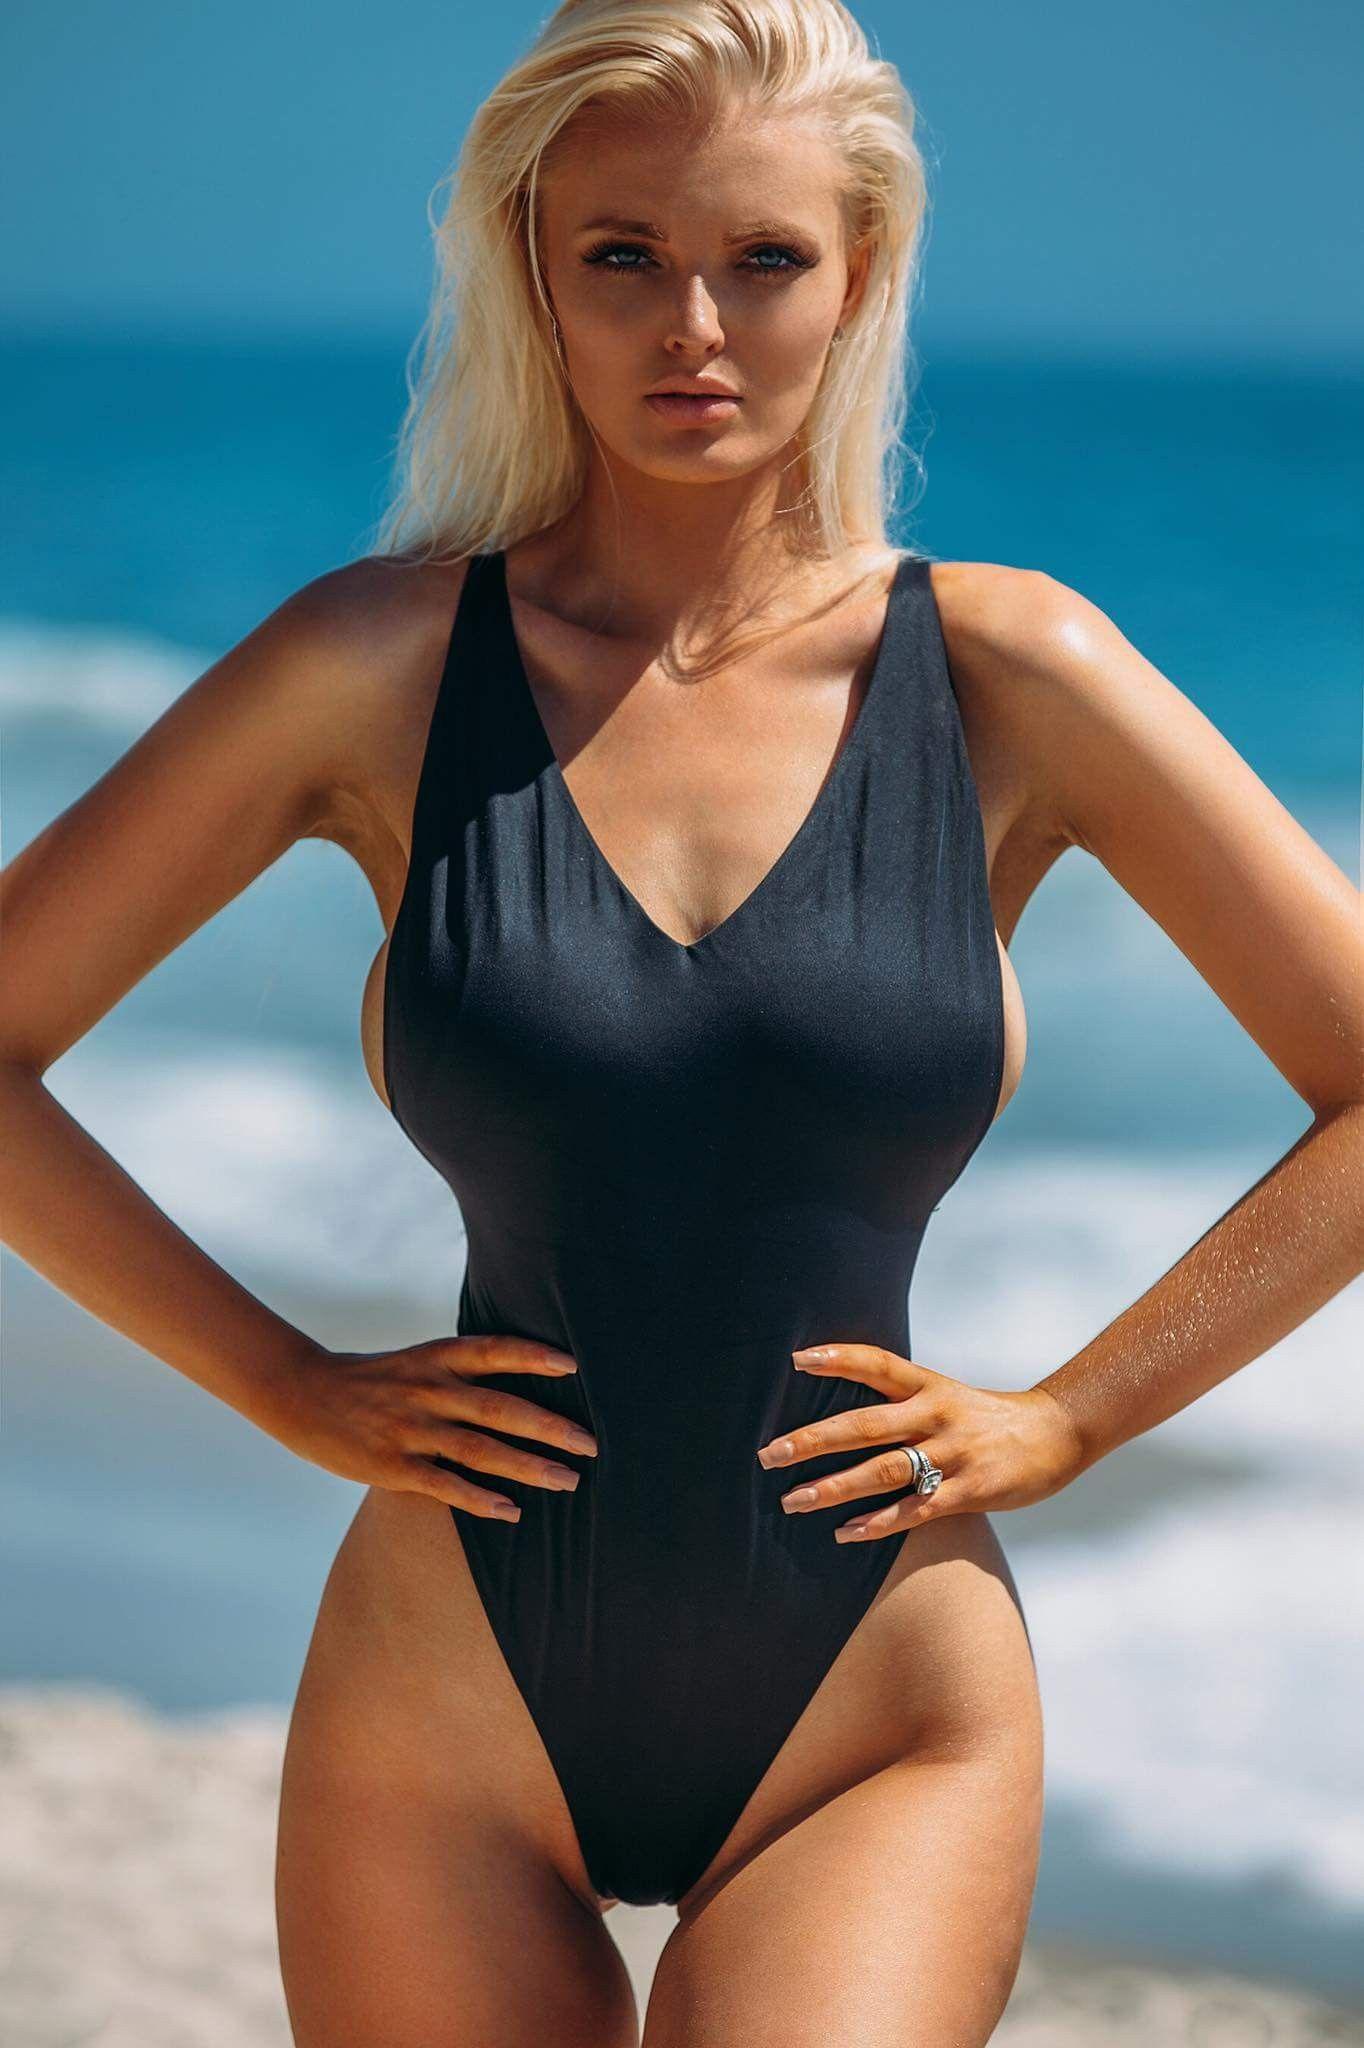 1973106b8b Zienna Eve Sonne Williams | Zienna Eve Sonne Williams | Bikini girls ...